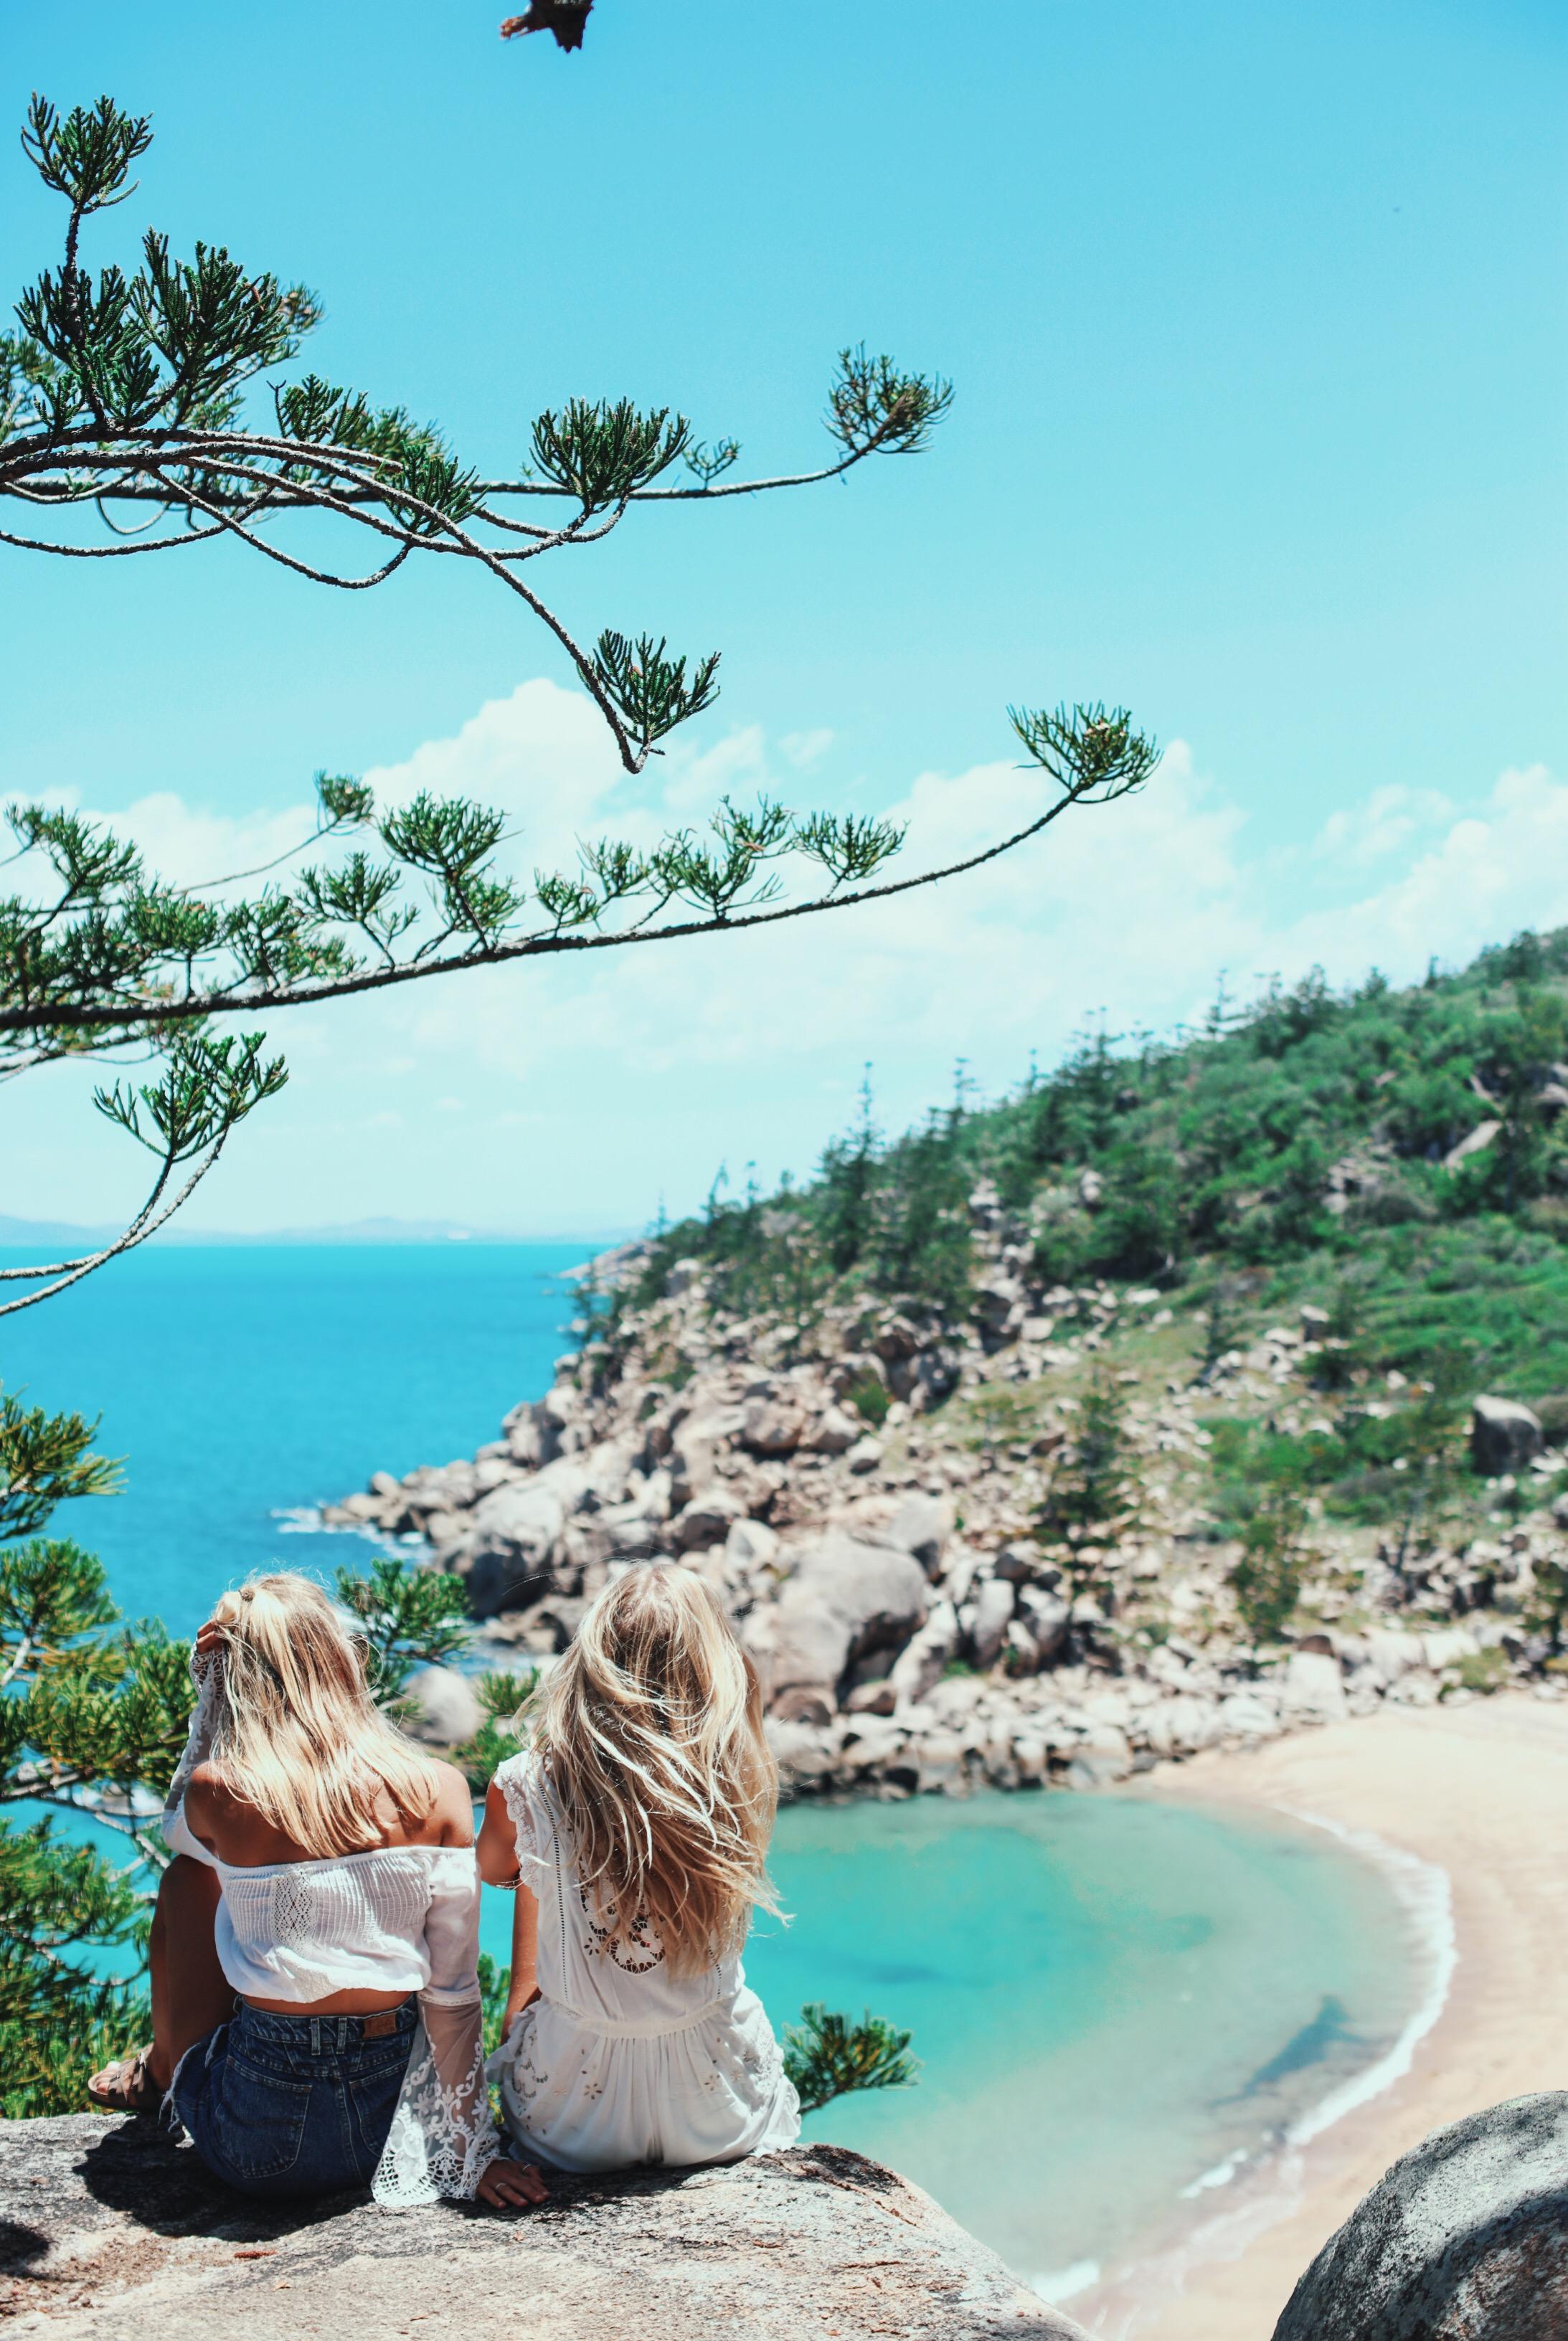 Arthur bay lookout